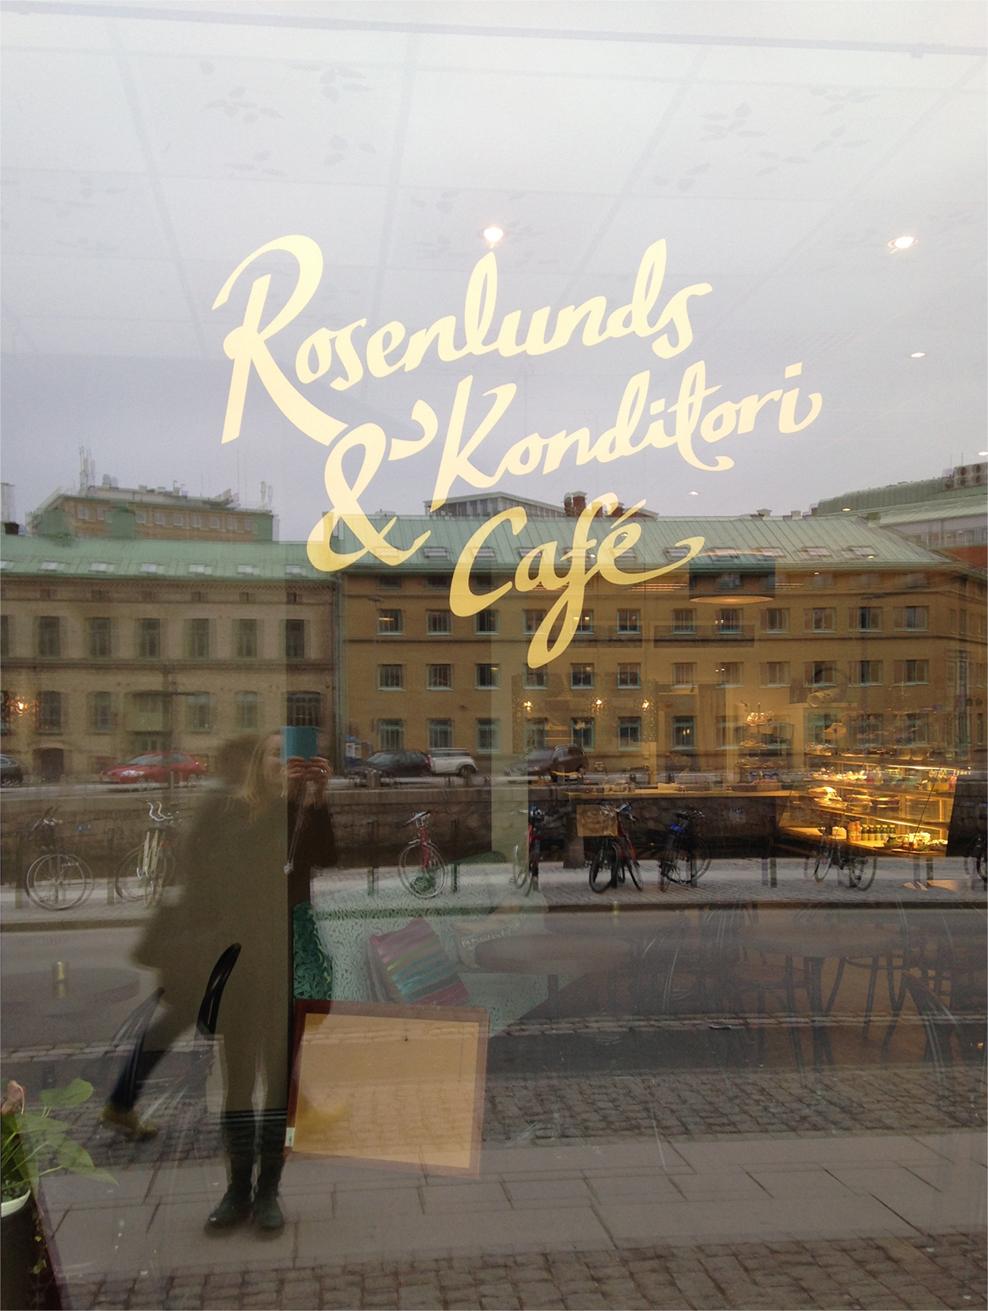 RosenlundsCafeKonditori